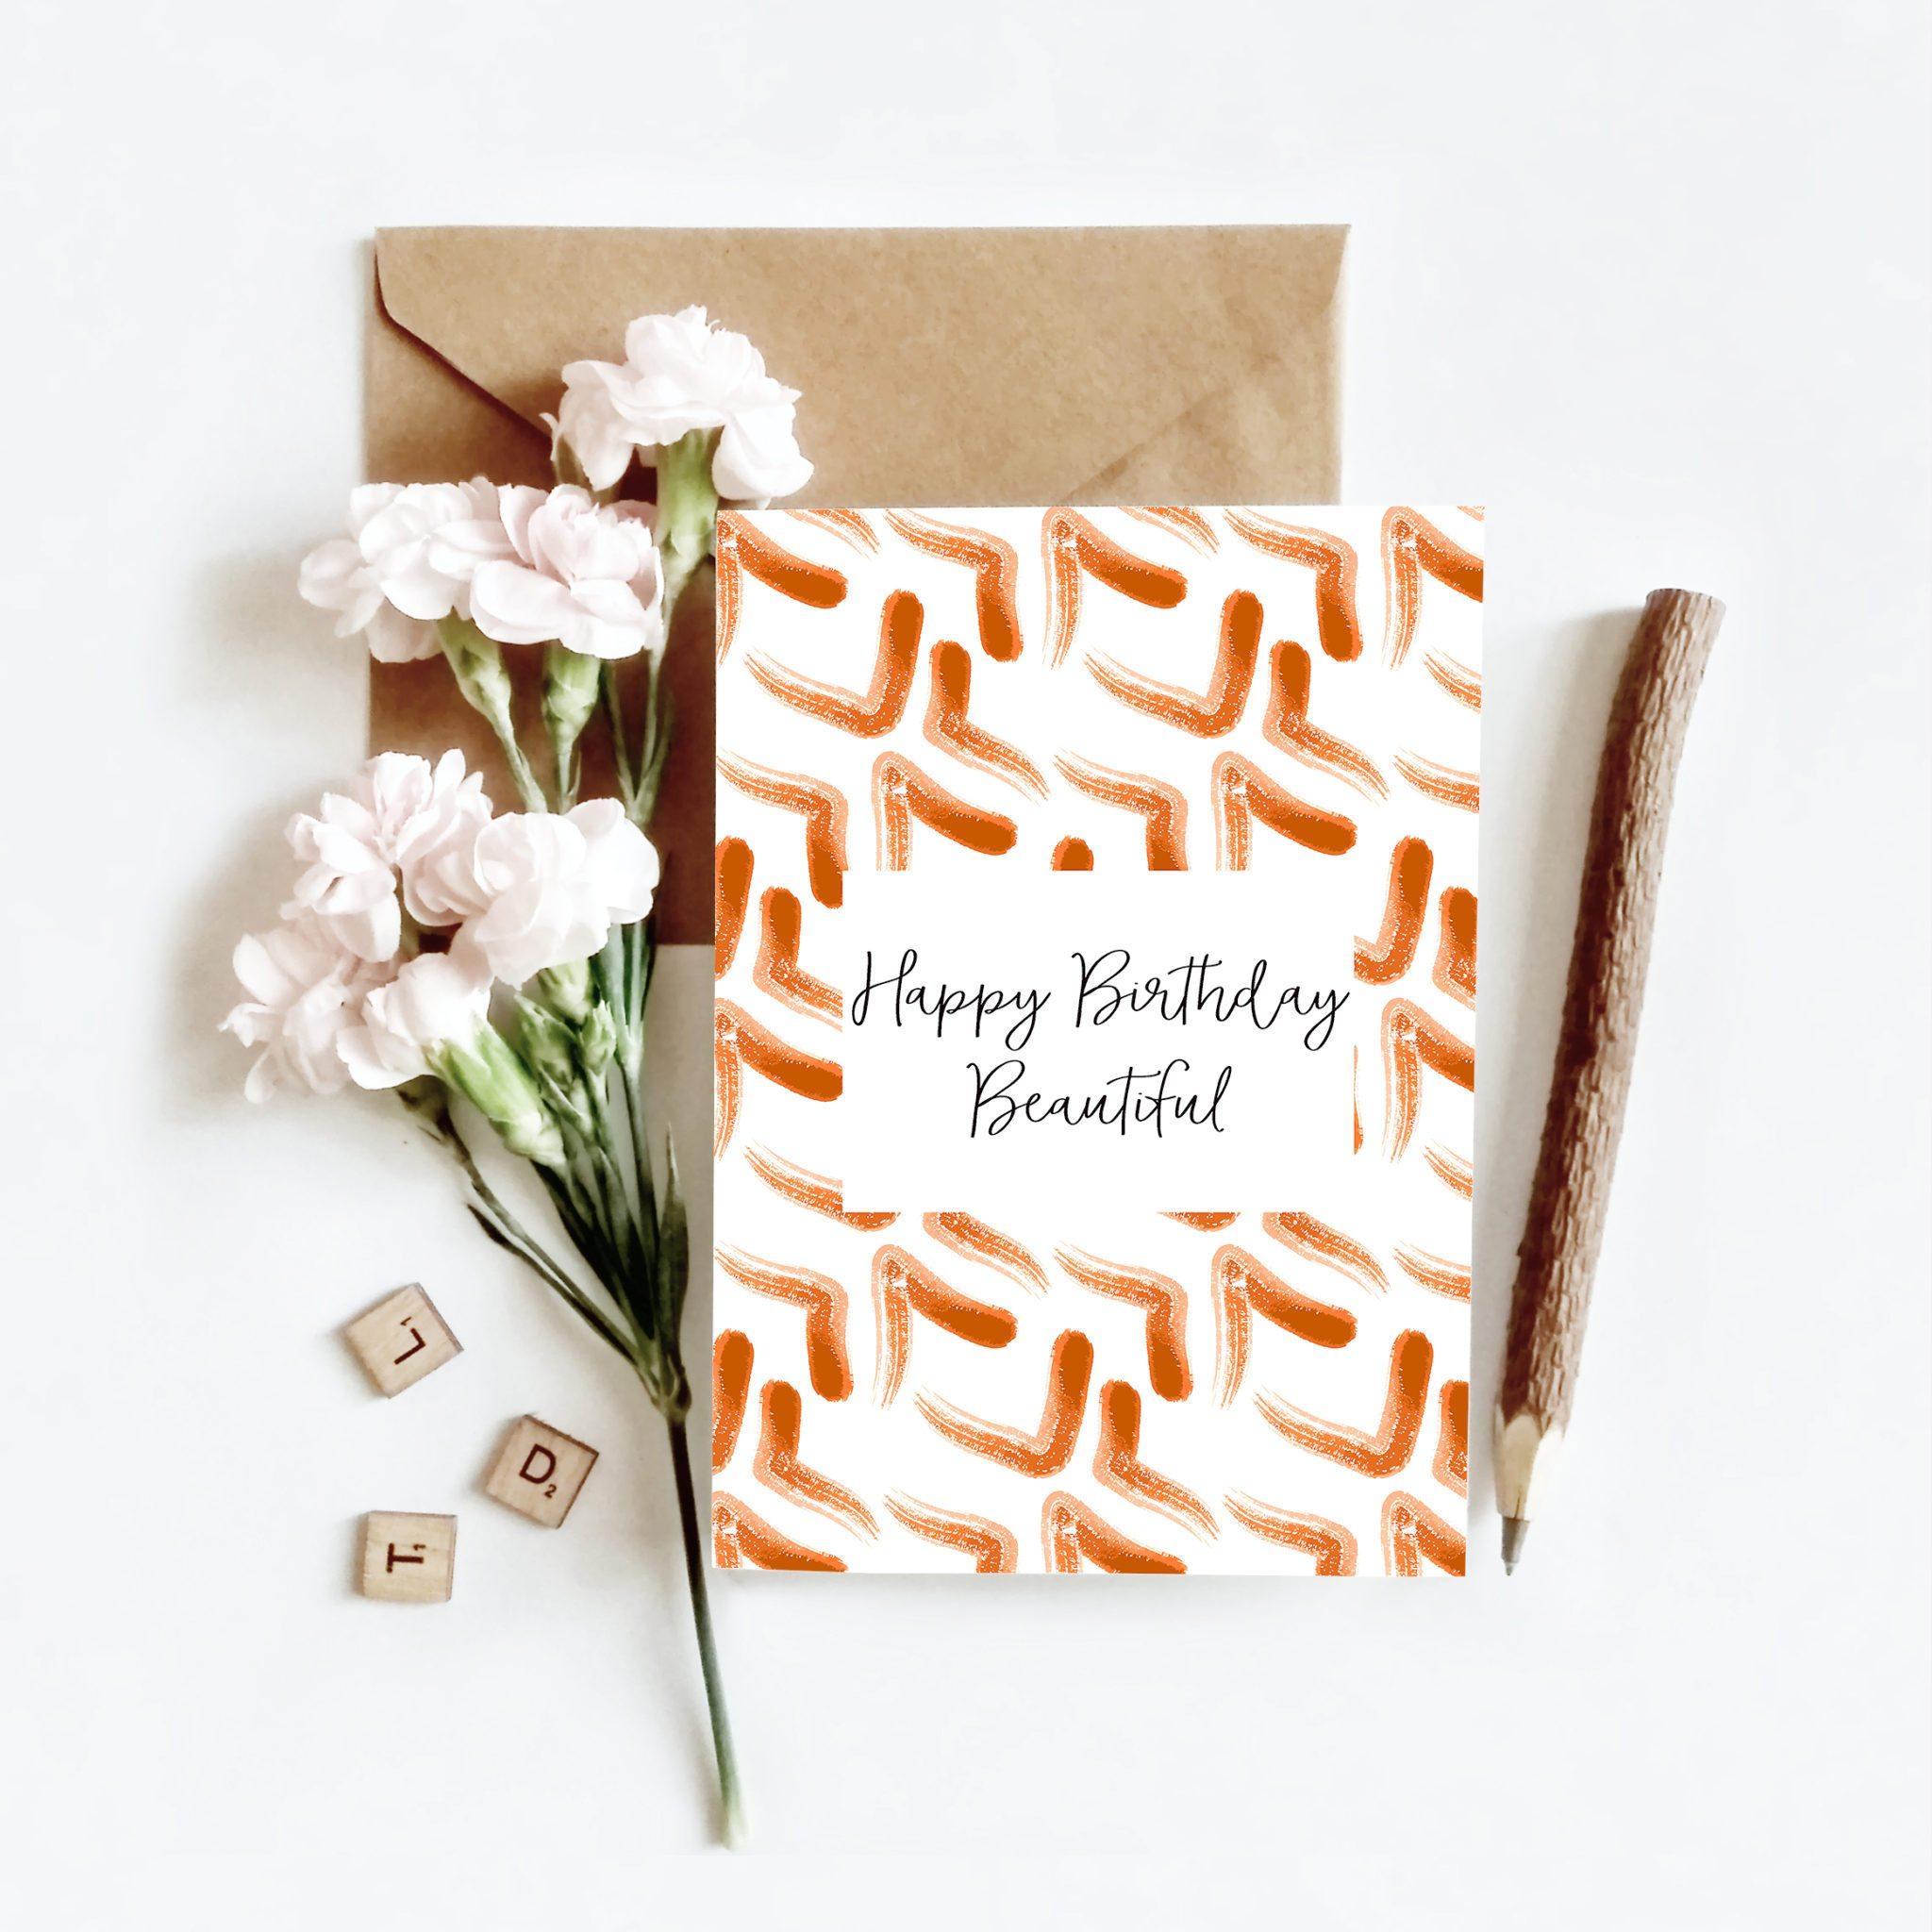 Happy Birthday Beautiful Birthday Card